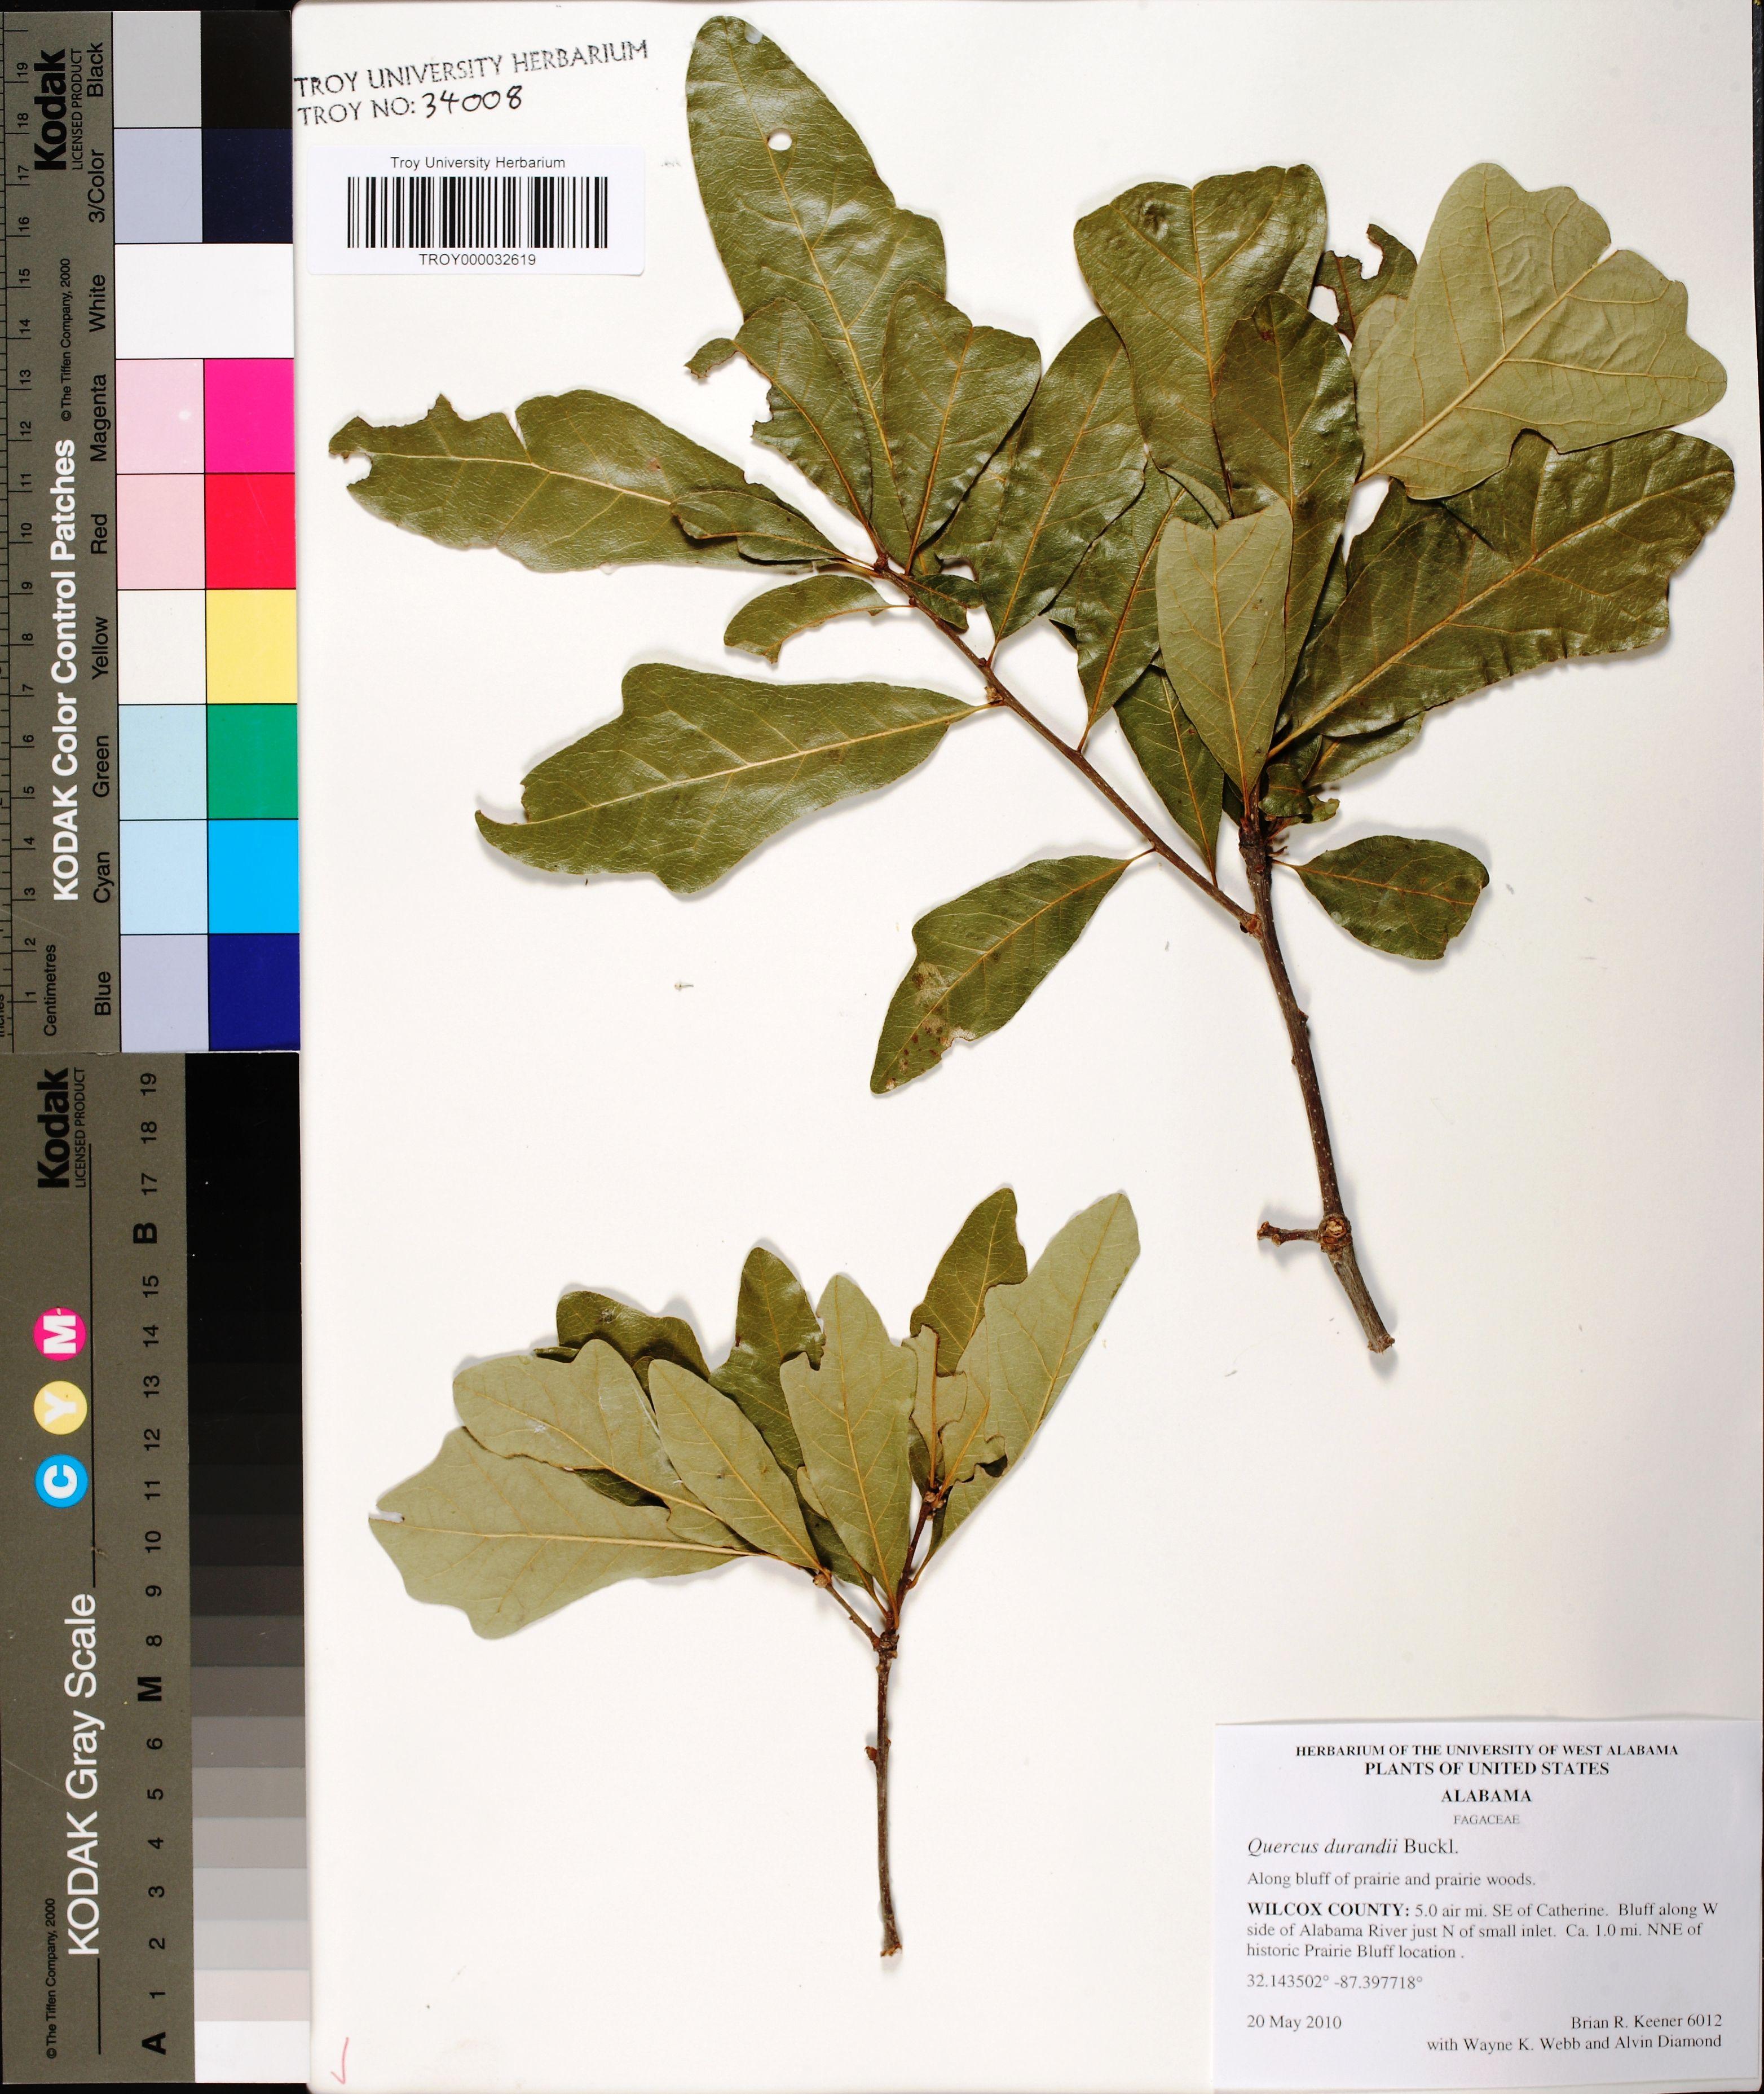 Alabama wilcox county catherine - Herbarium